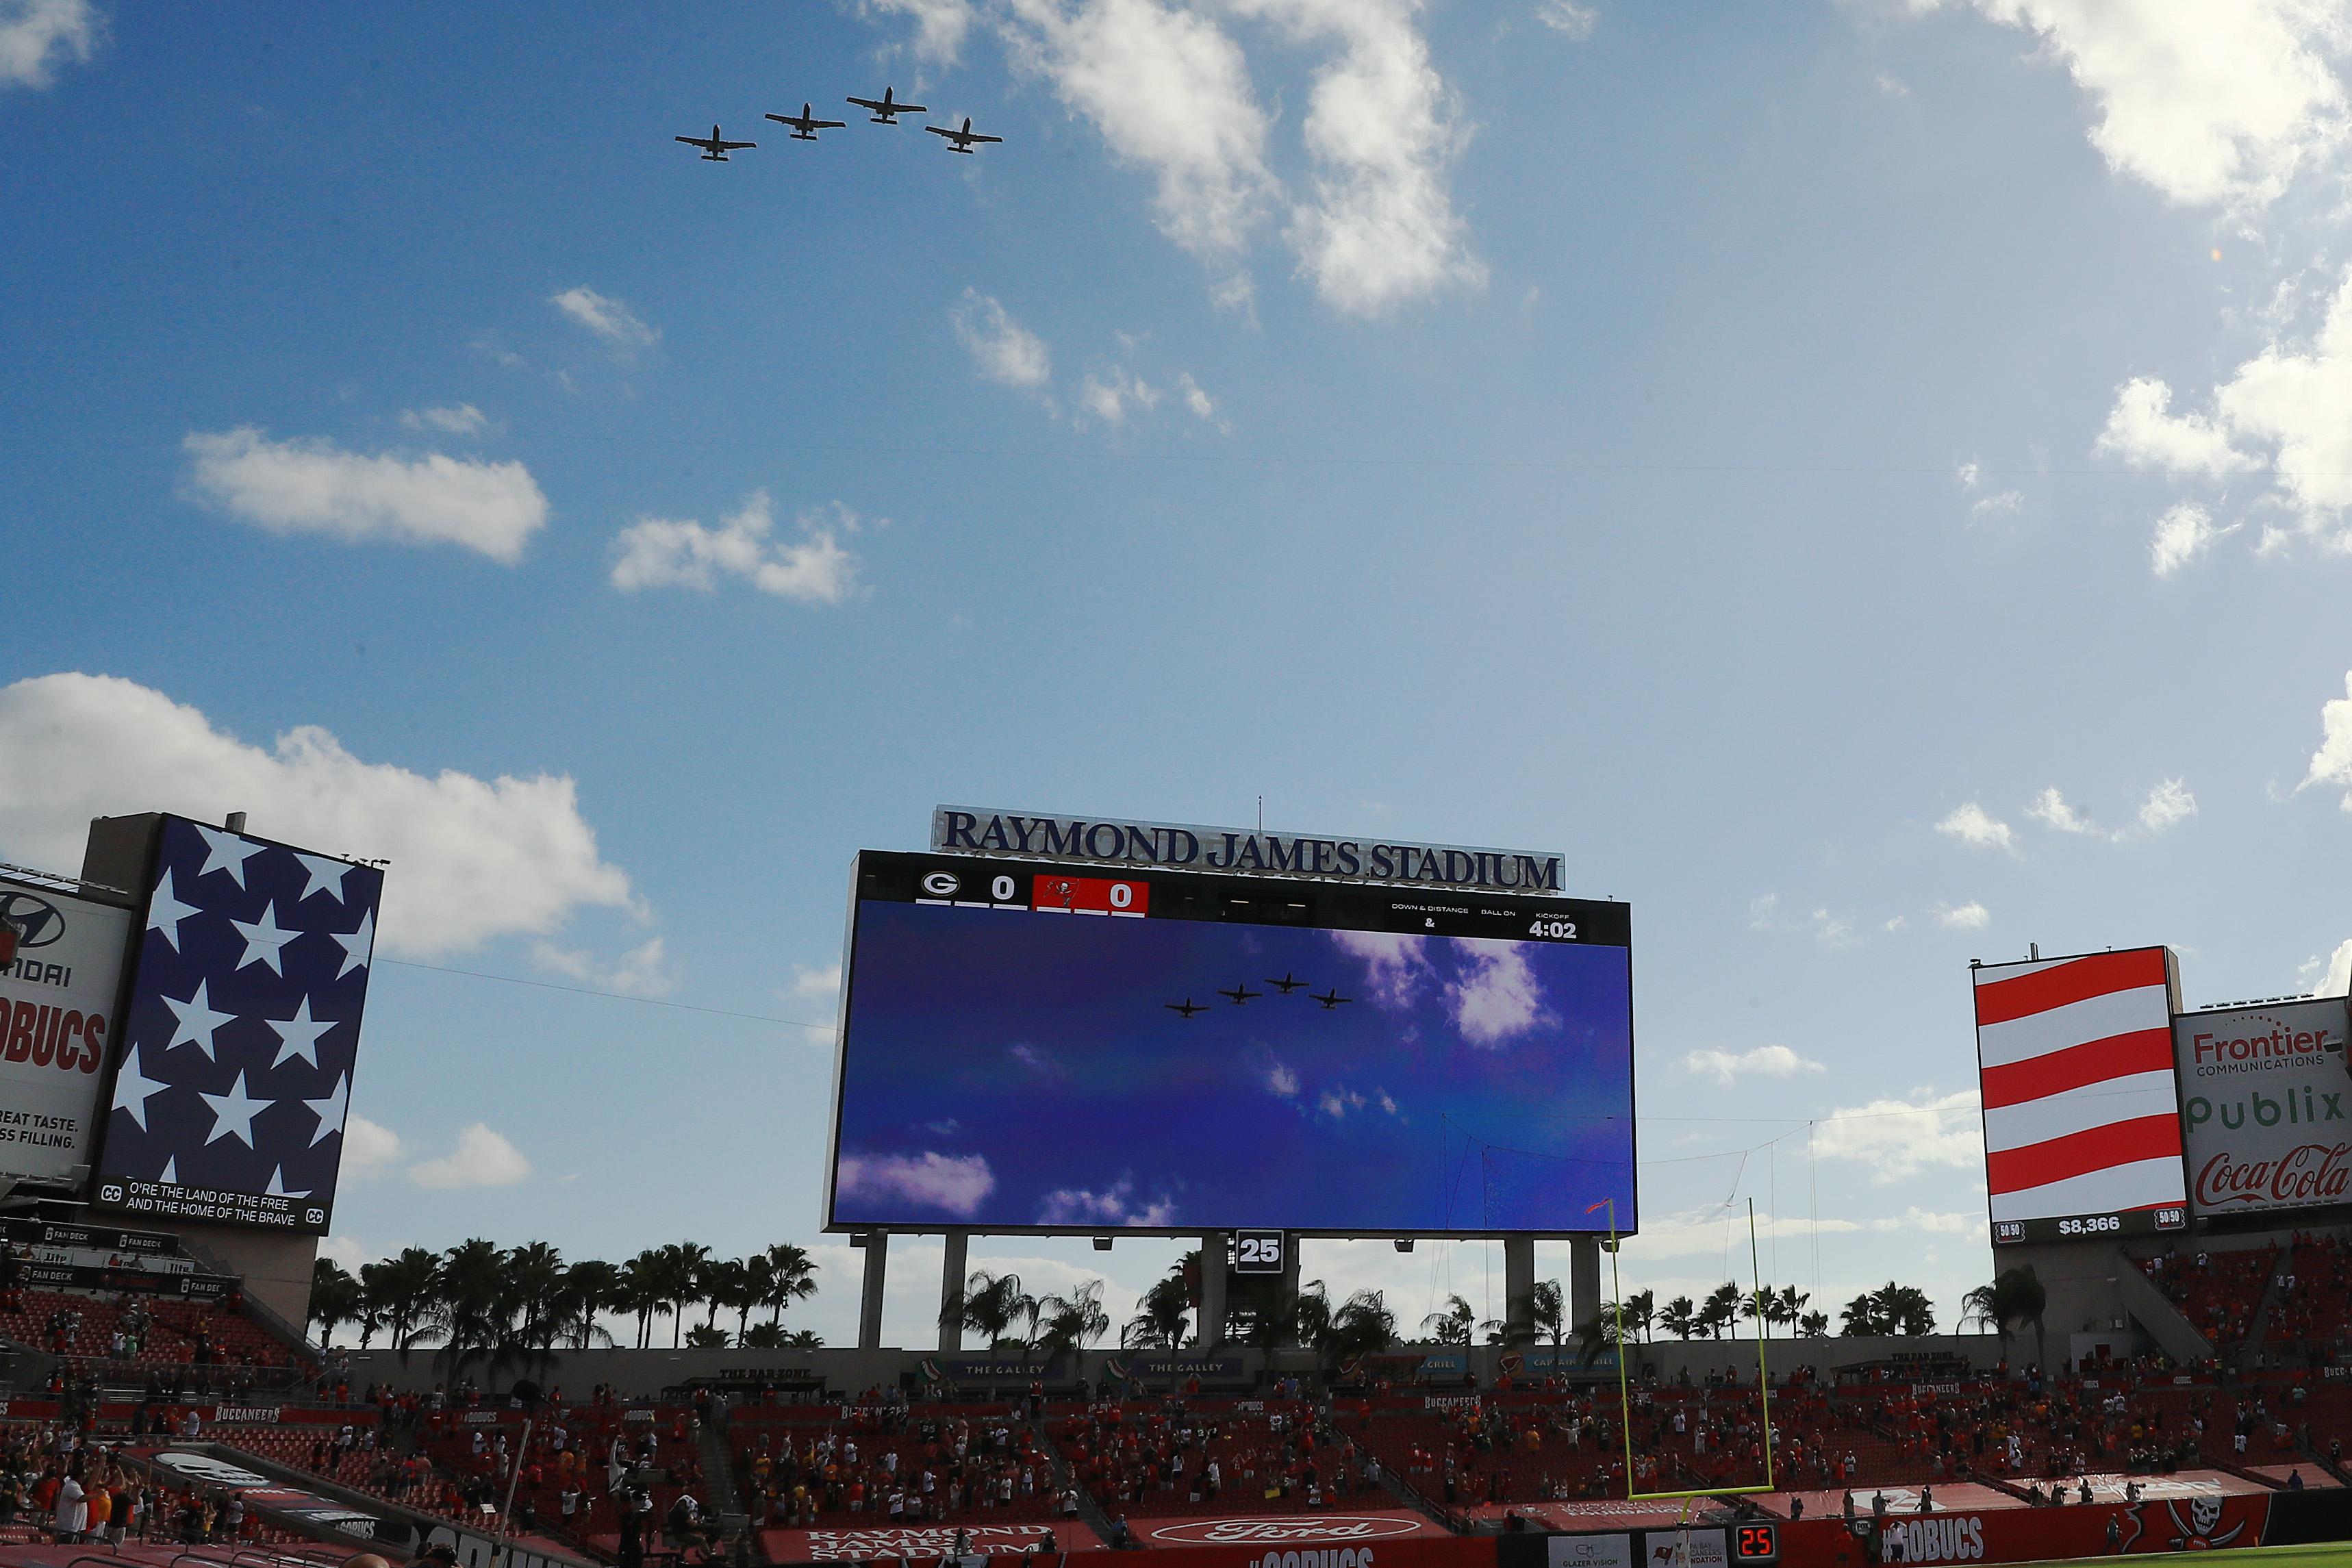 Military flyover at Raymond James Stadium